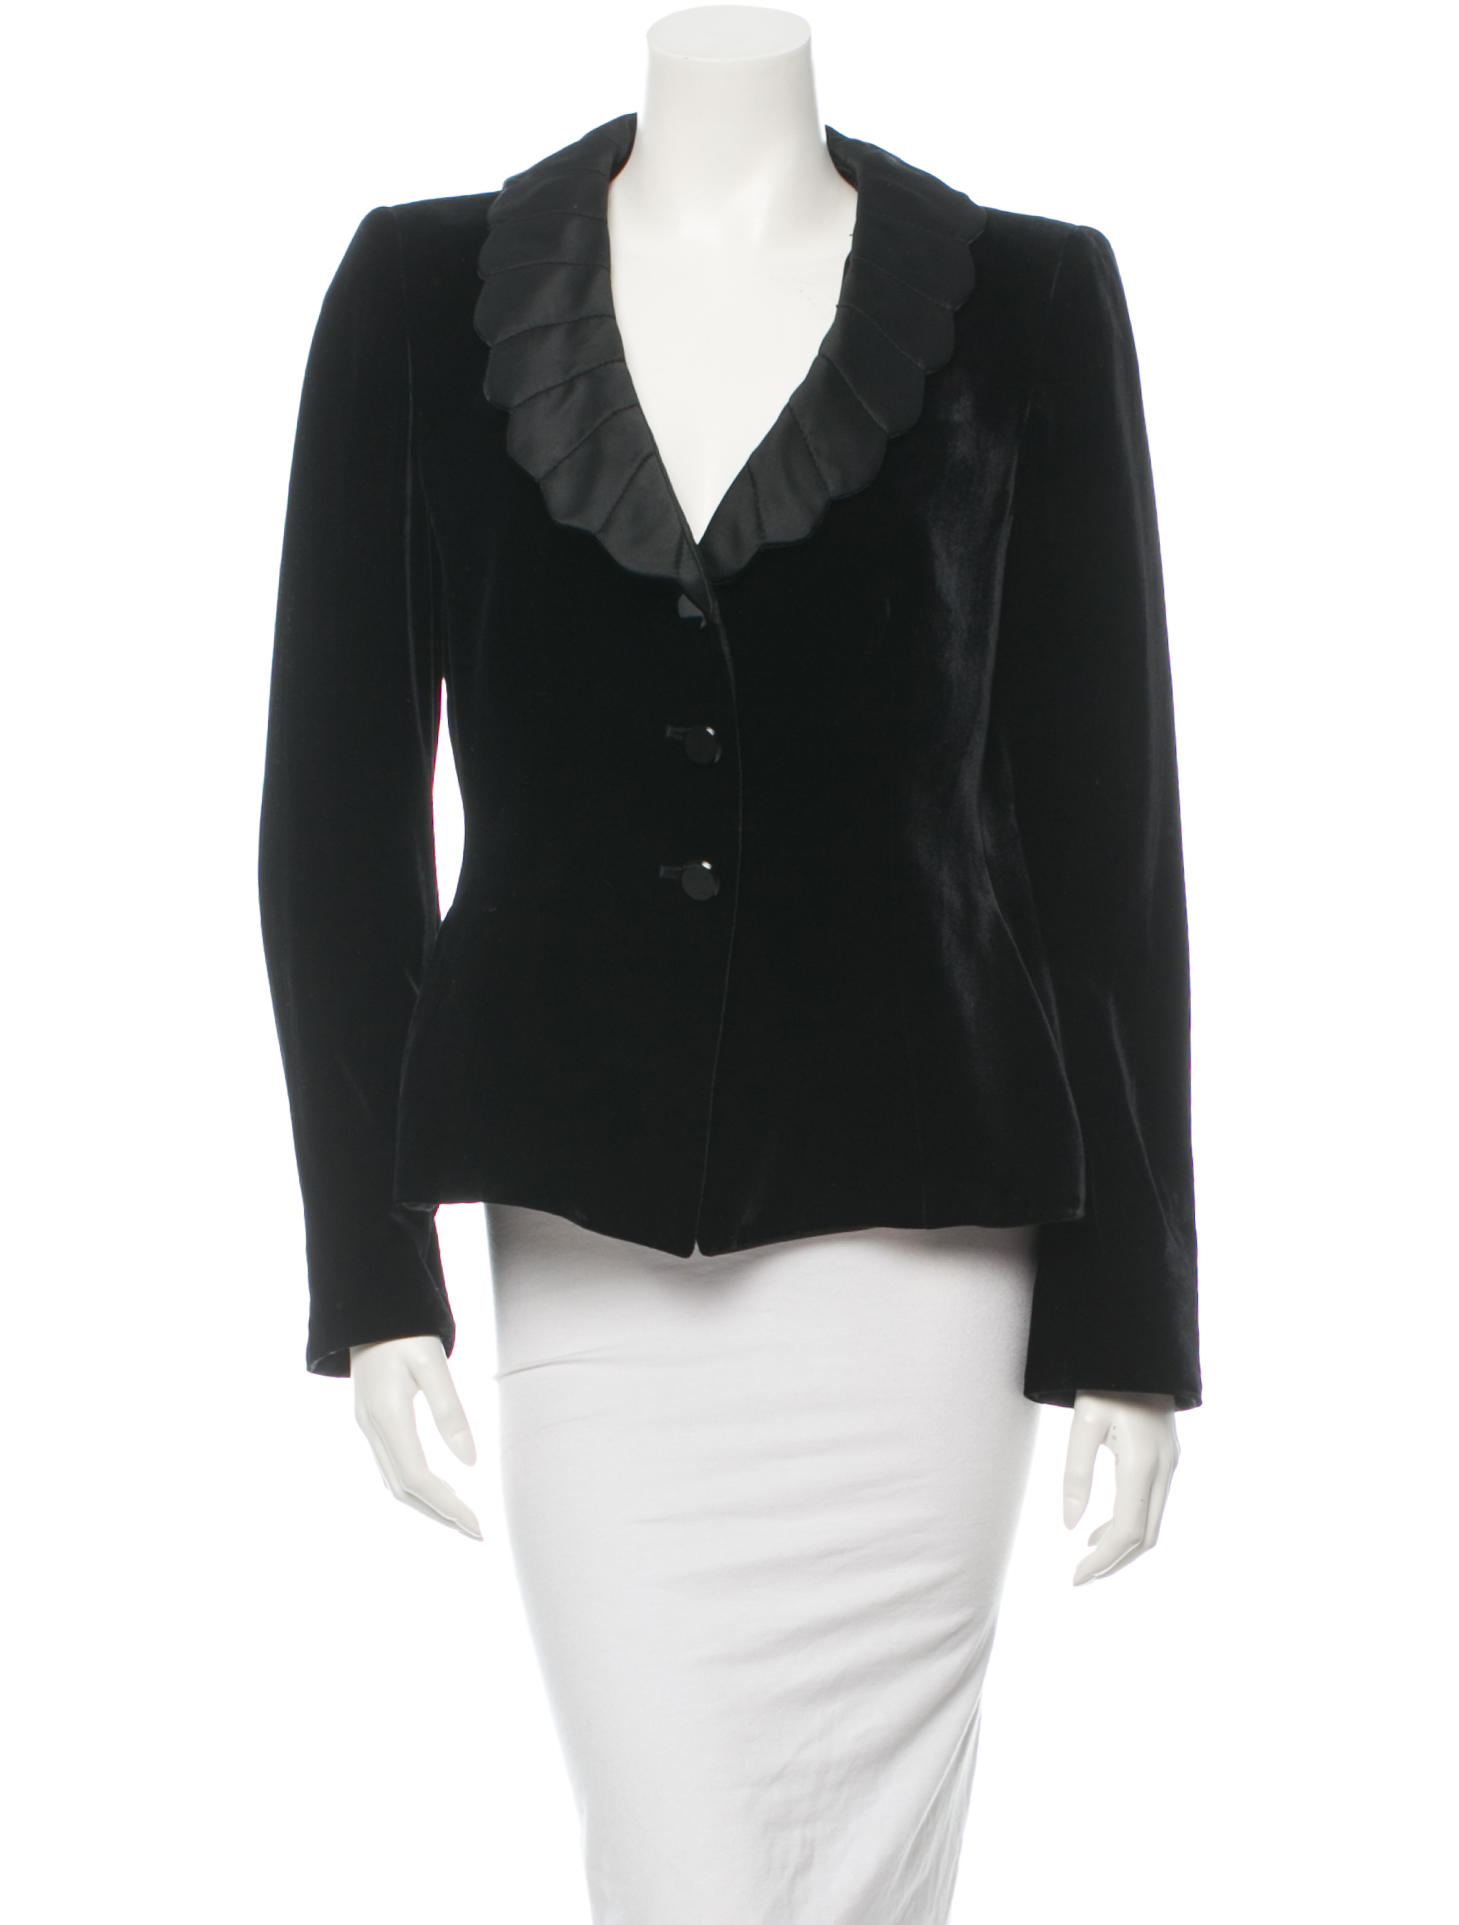 Armani Collezioni Jacket black.jpg